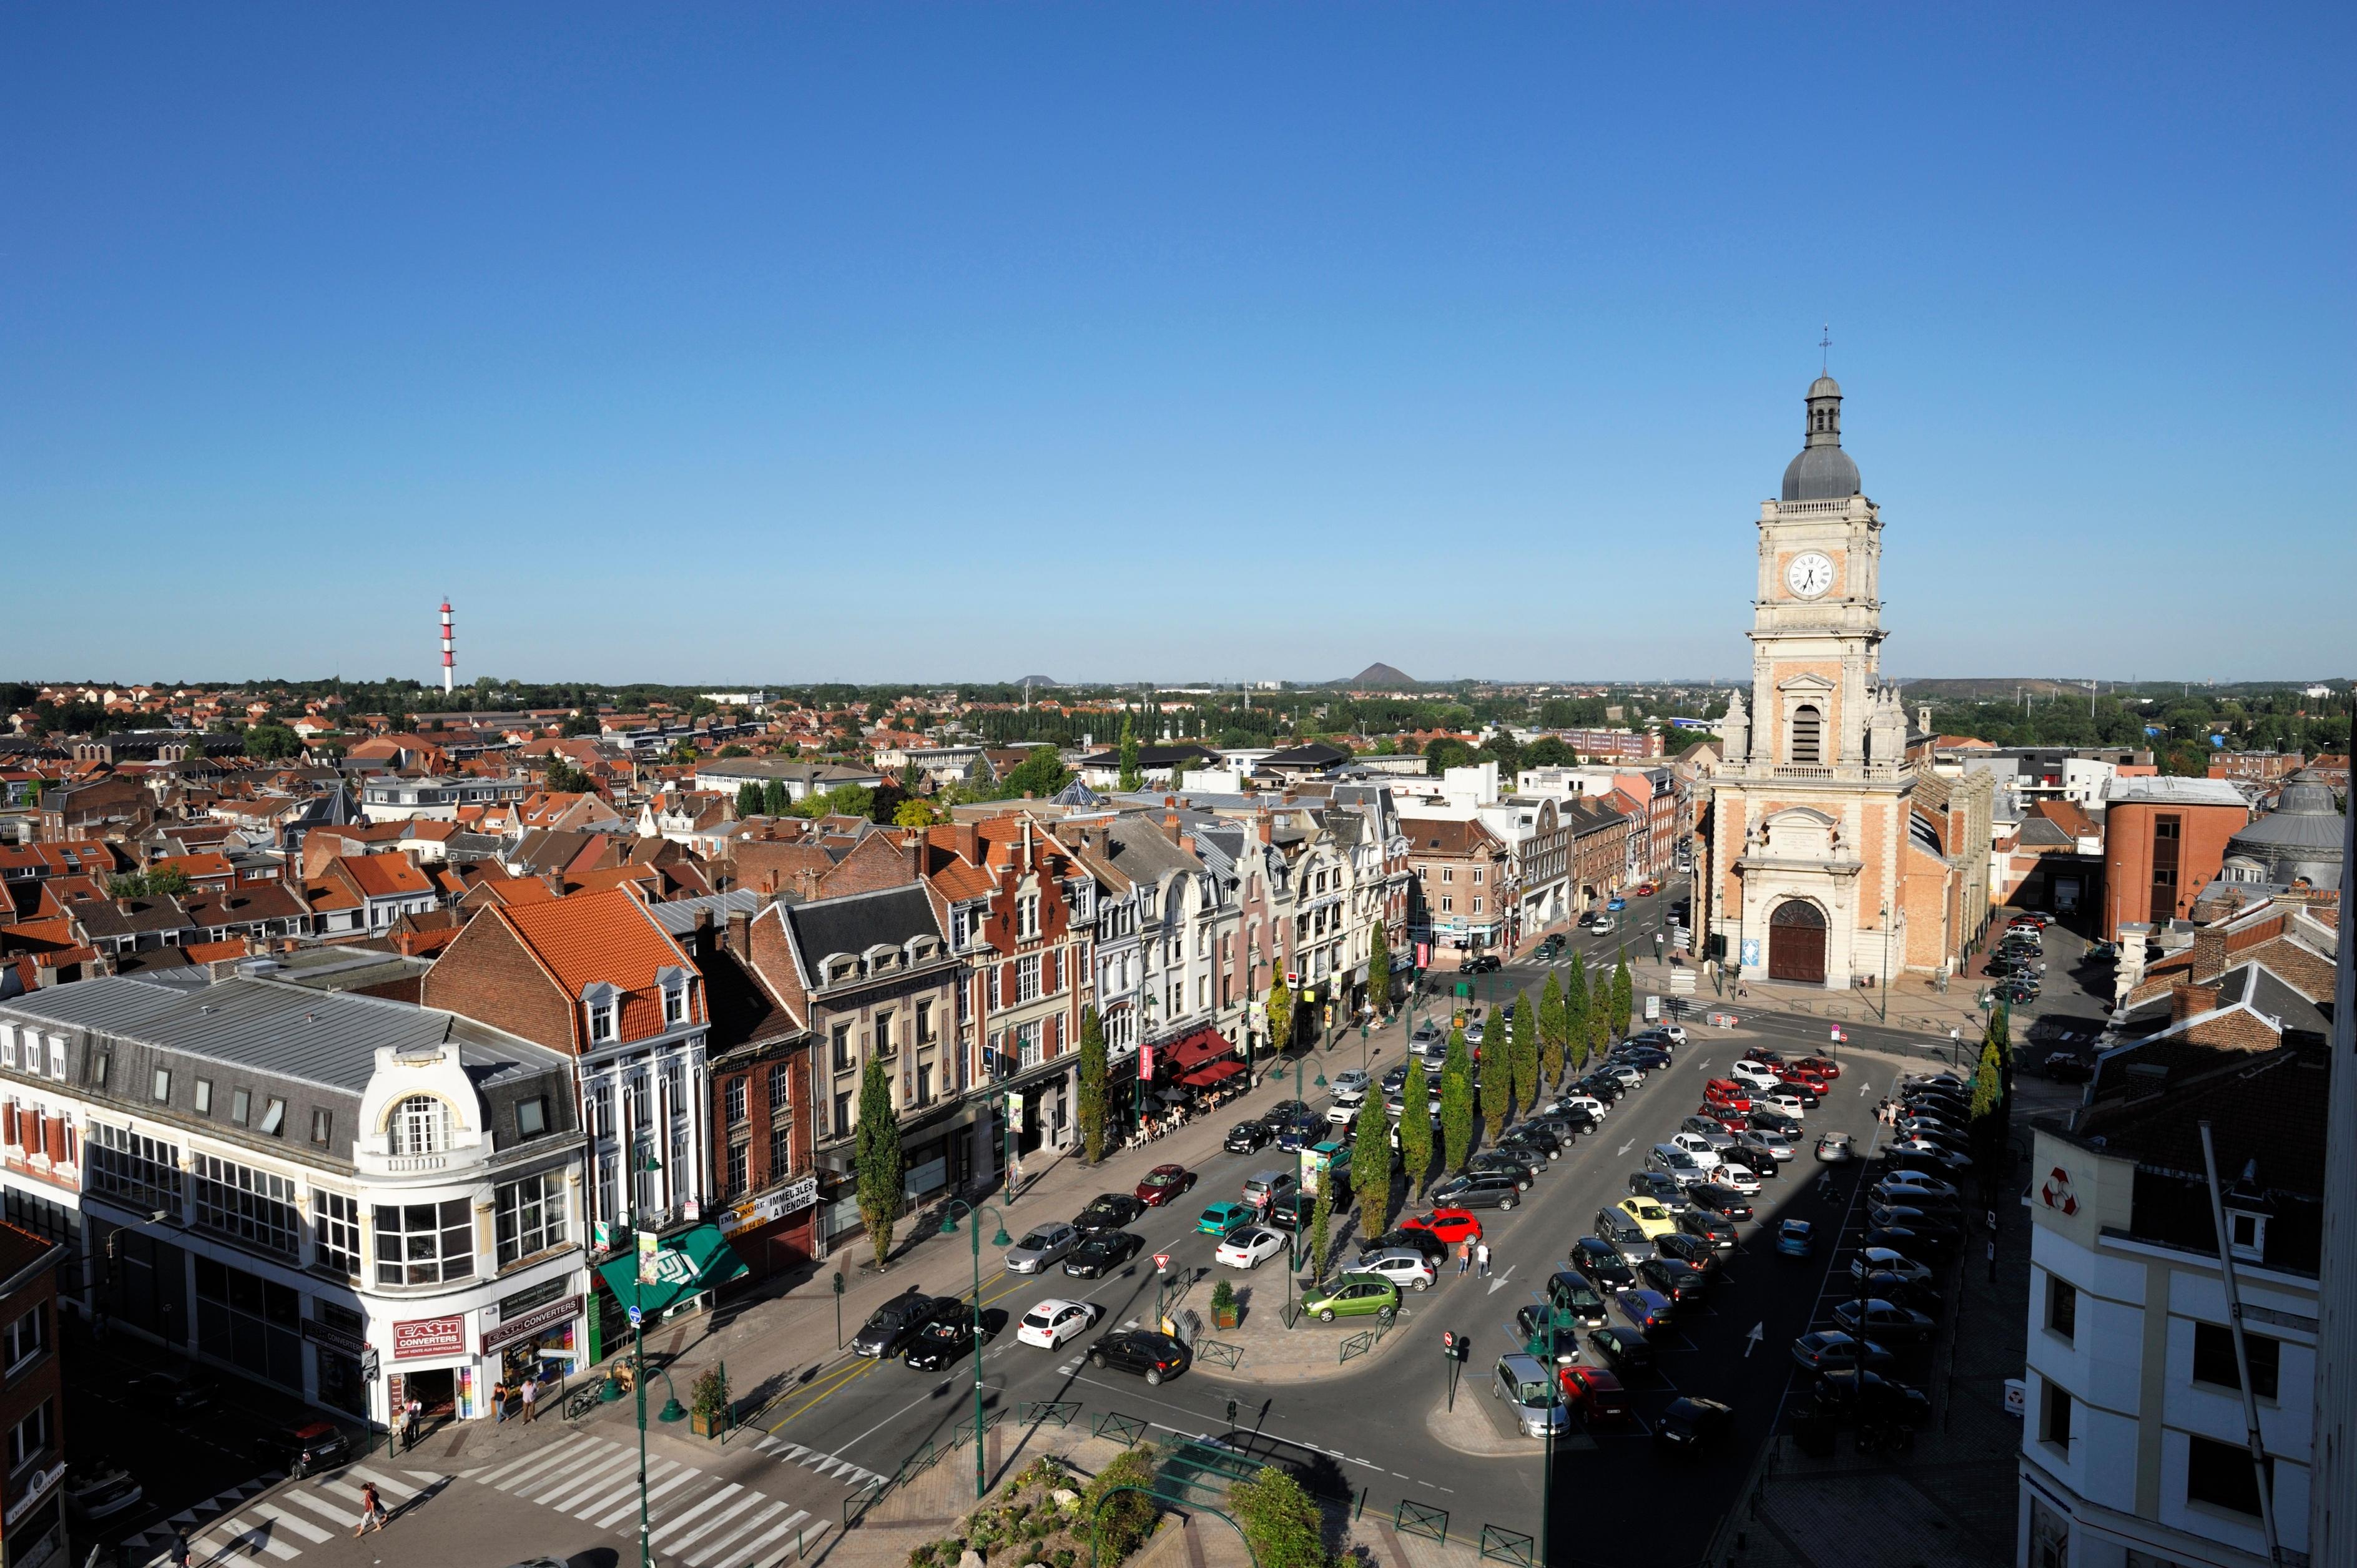 Lens, Pas-de-Calais, France